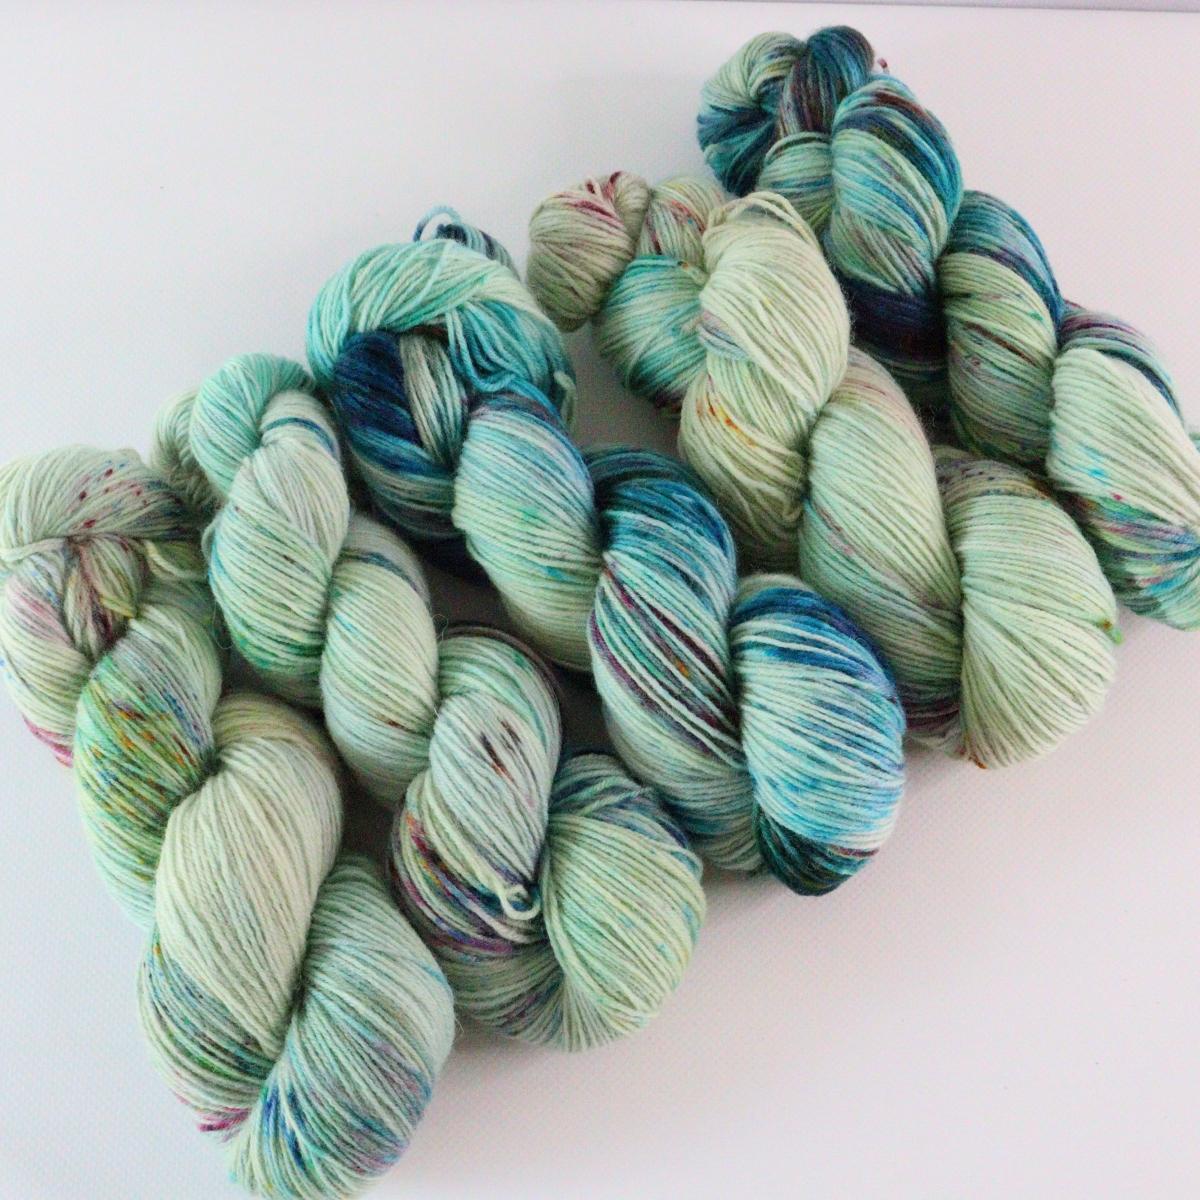 woodico.pro hand dyed yarn 072 2 1200x1200 - Hand dyed yarn / 072